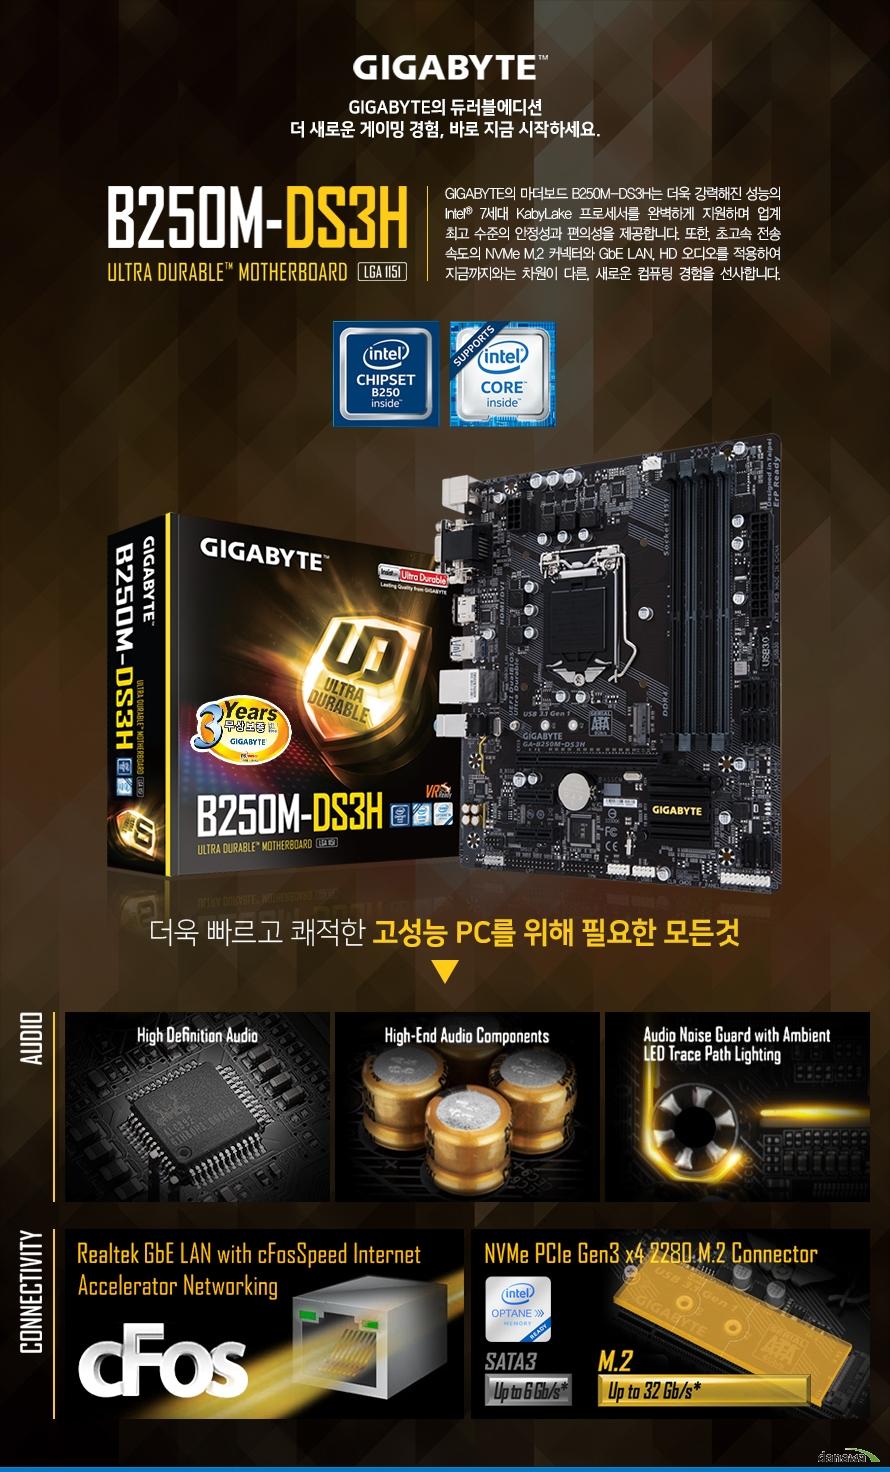 GIGABYTE B250M DS3H 피씨디렉트 GIGABYTE의 마더보드 B250M-DS3H는 더욱 강력해진 성능의 Intel 7세대 KabyLake 프로세서를 완벽하게 지원하며 업계 최고 수준의 안정성과 편의성을 제공합니다. 또한, 초고속 전송 속도의 NVMe M.2 커넥터와 GbE LAN, HD 오디오를 적용하여 지금까지와는 차원이 다른, 새로운 컴퓨팅 경험을 선사합니다.